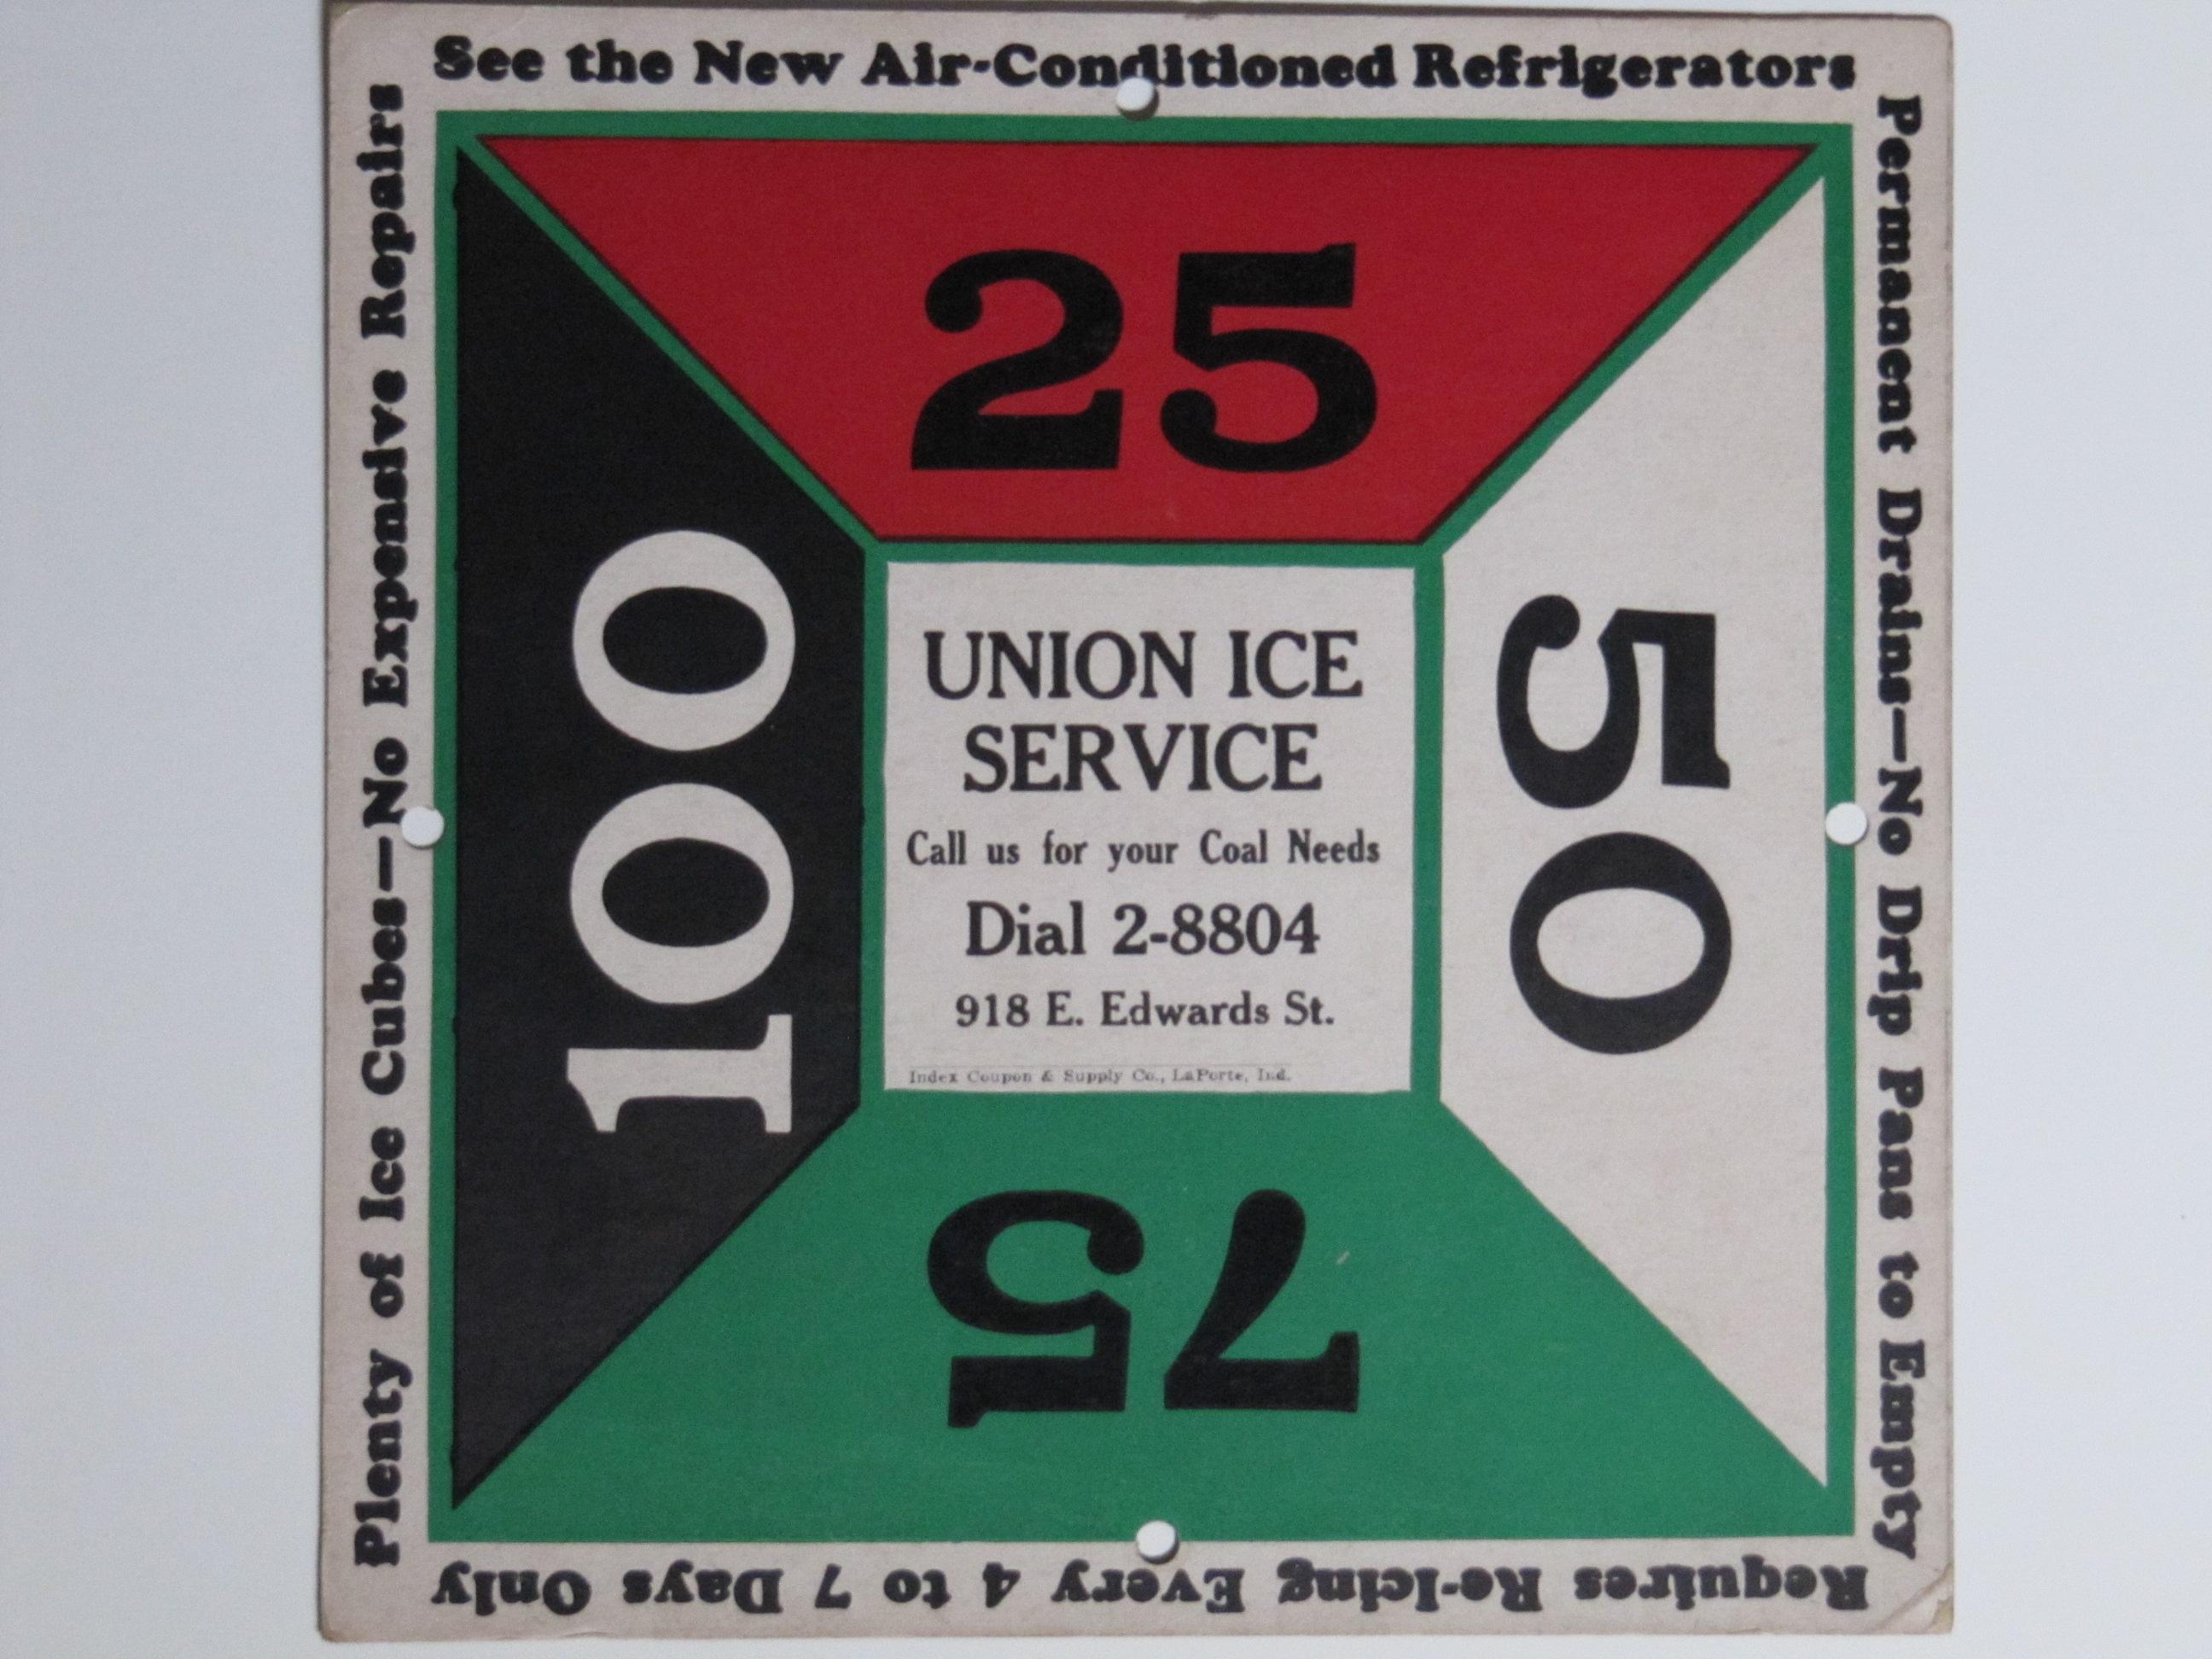 Union Ice Service